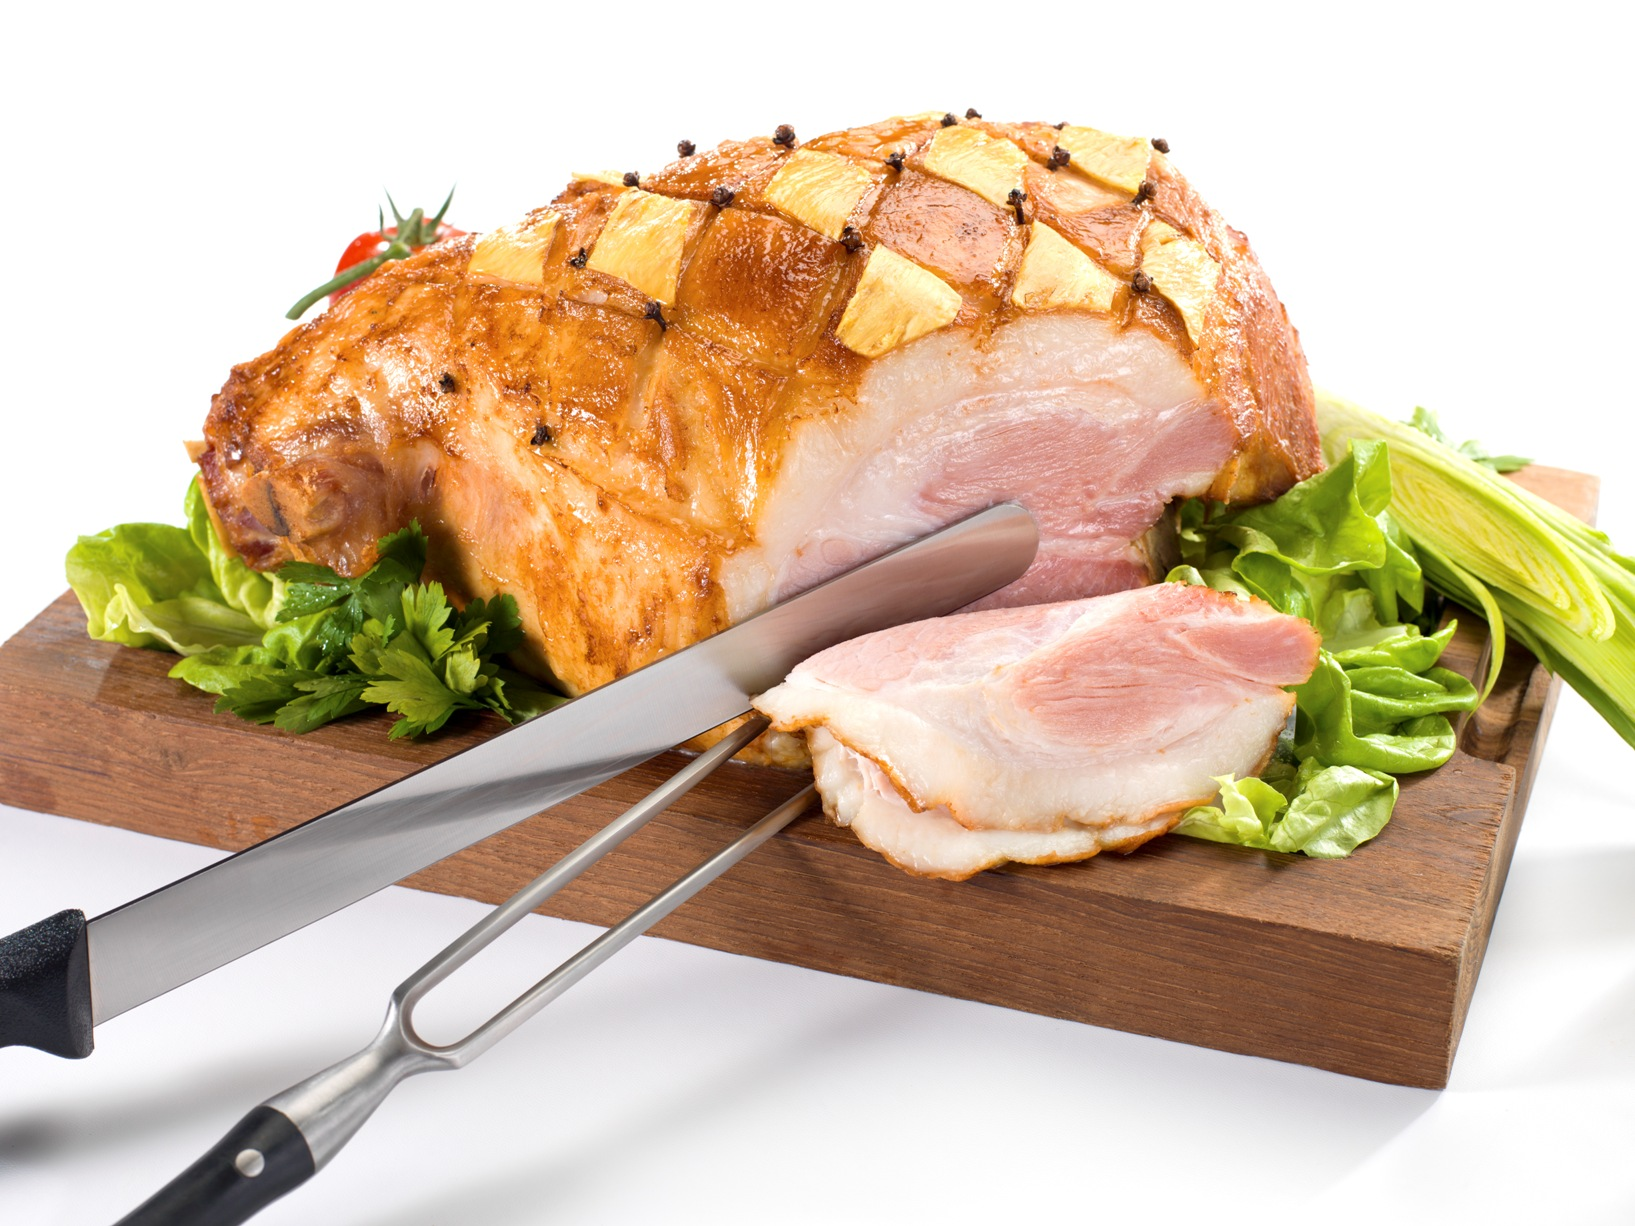 wswp-holldankin-foodstylist-015.jpg